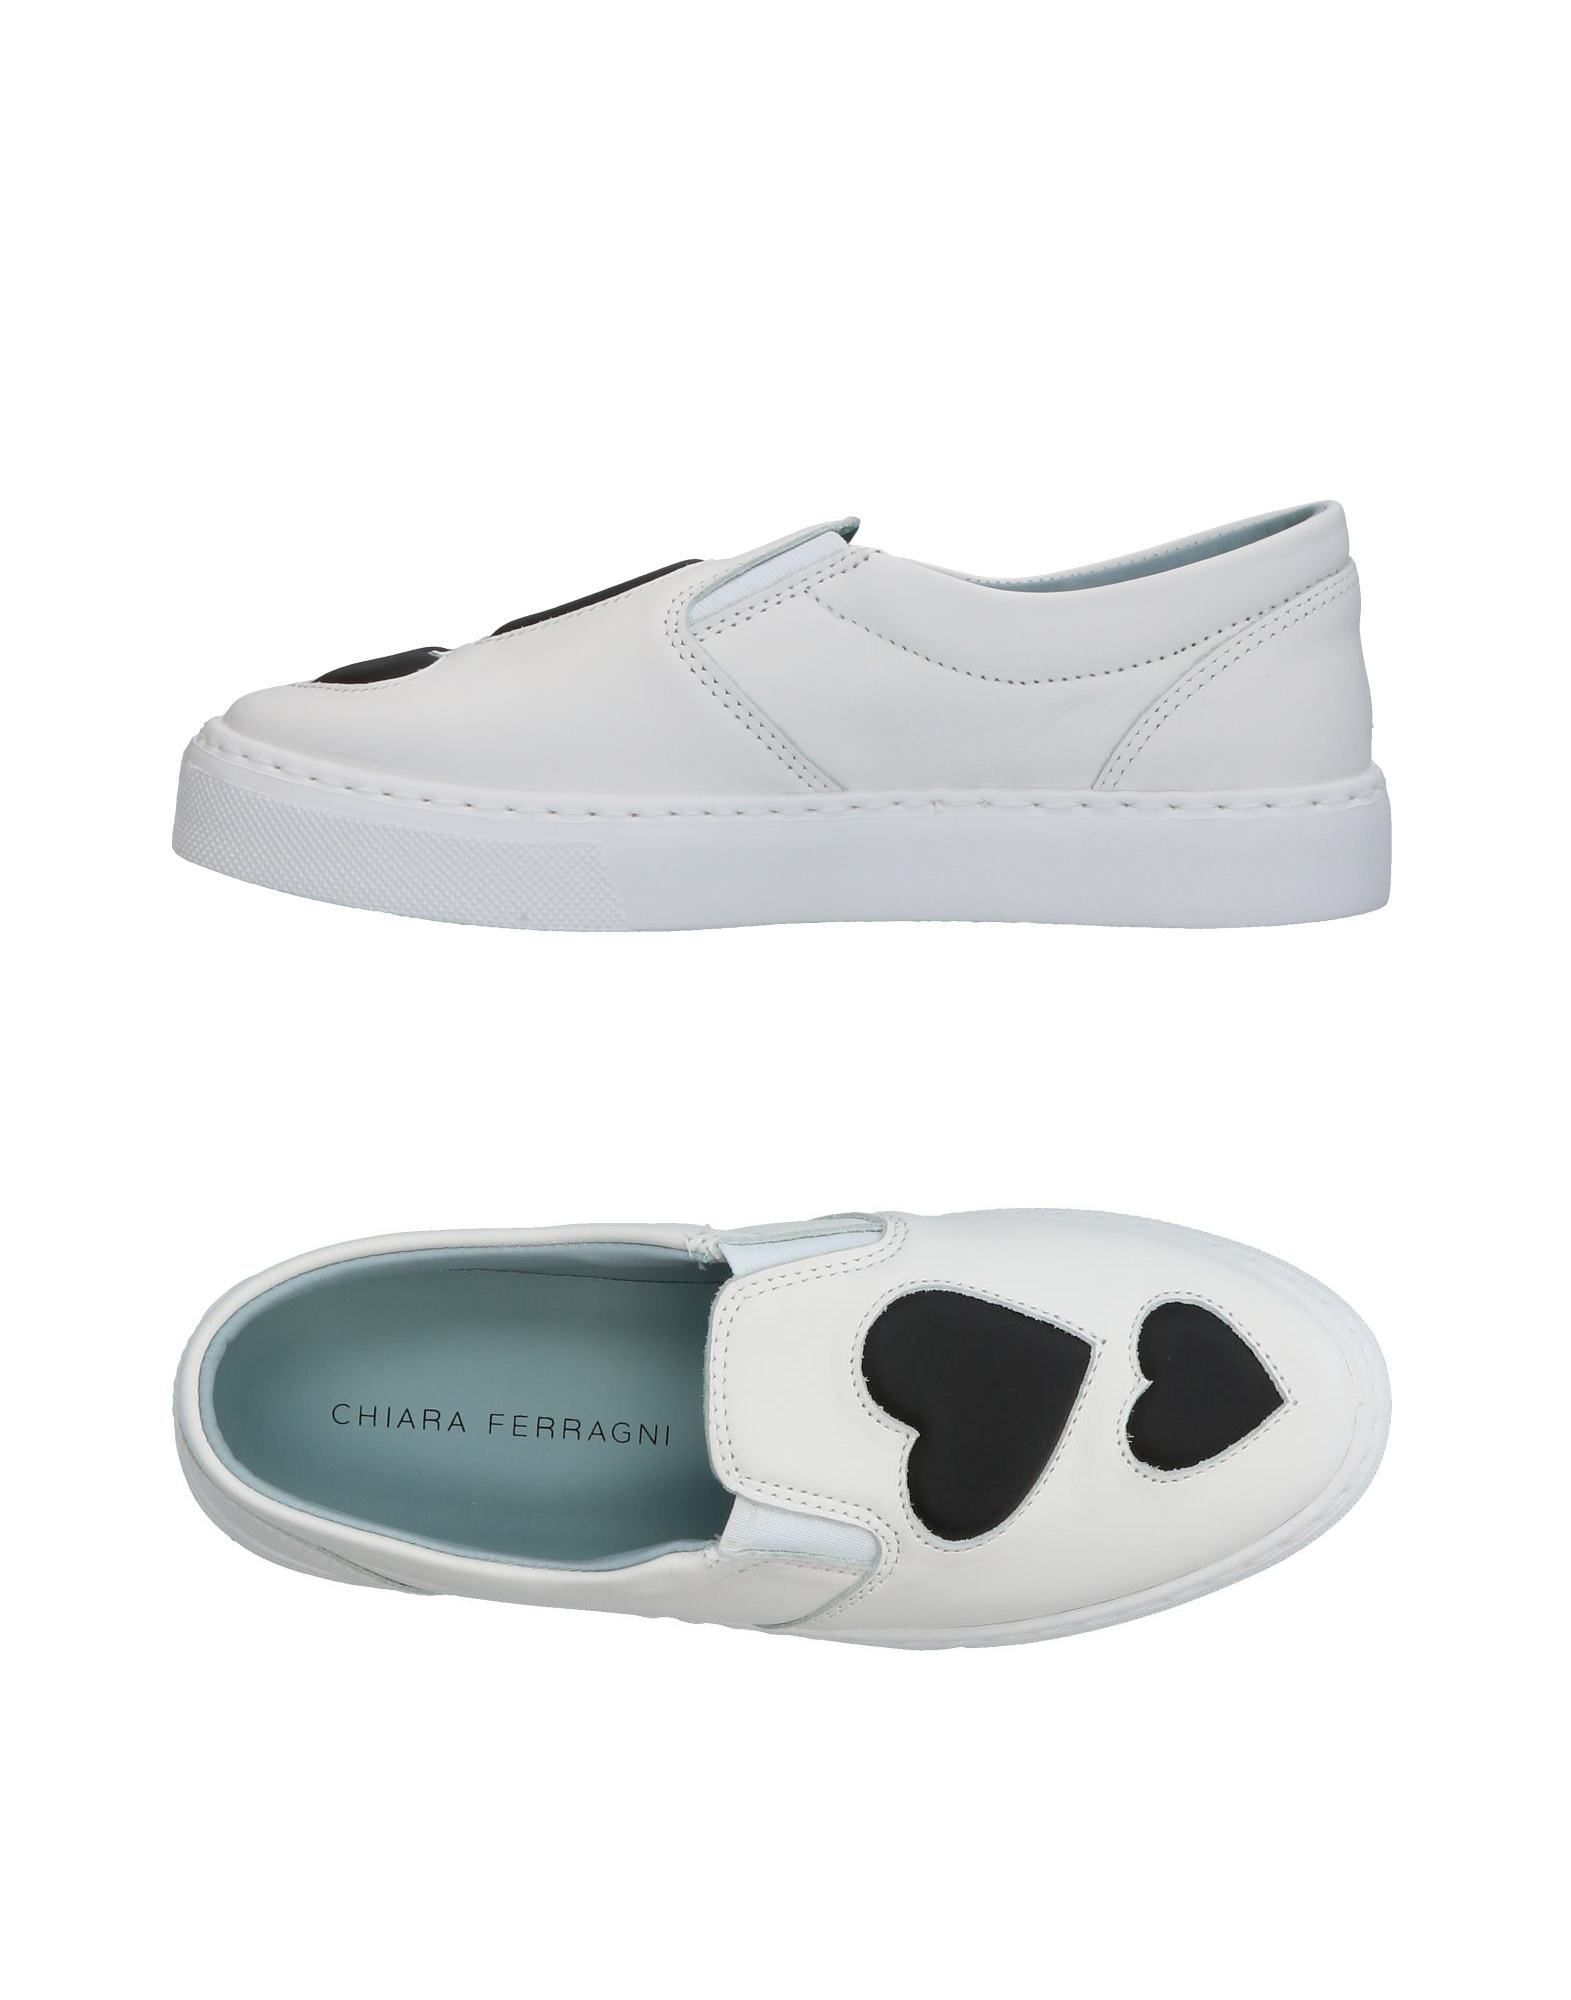 Chiara Ferragni Sneakers Damen beliebte  11358699JK Gute Qualität beliebte Damen Schuhe 63fe9c